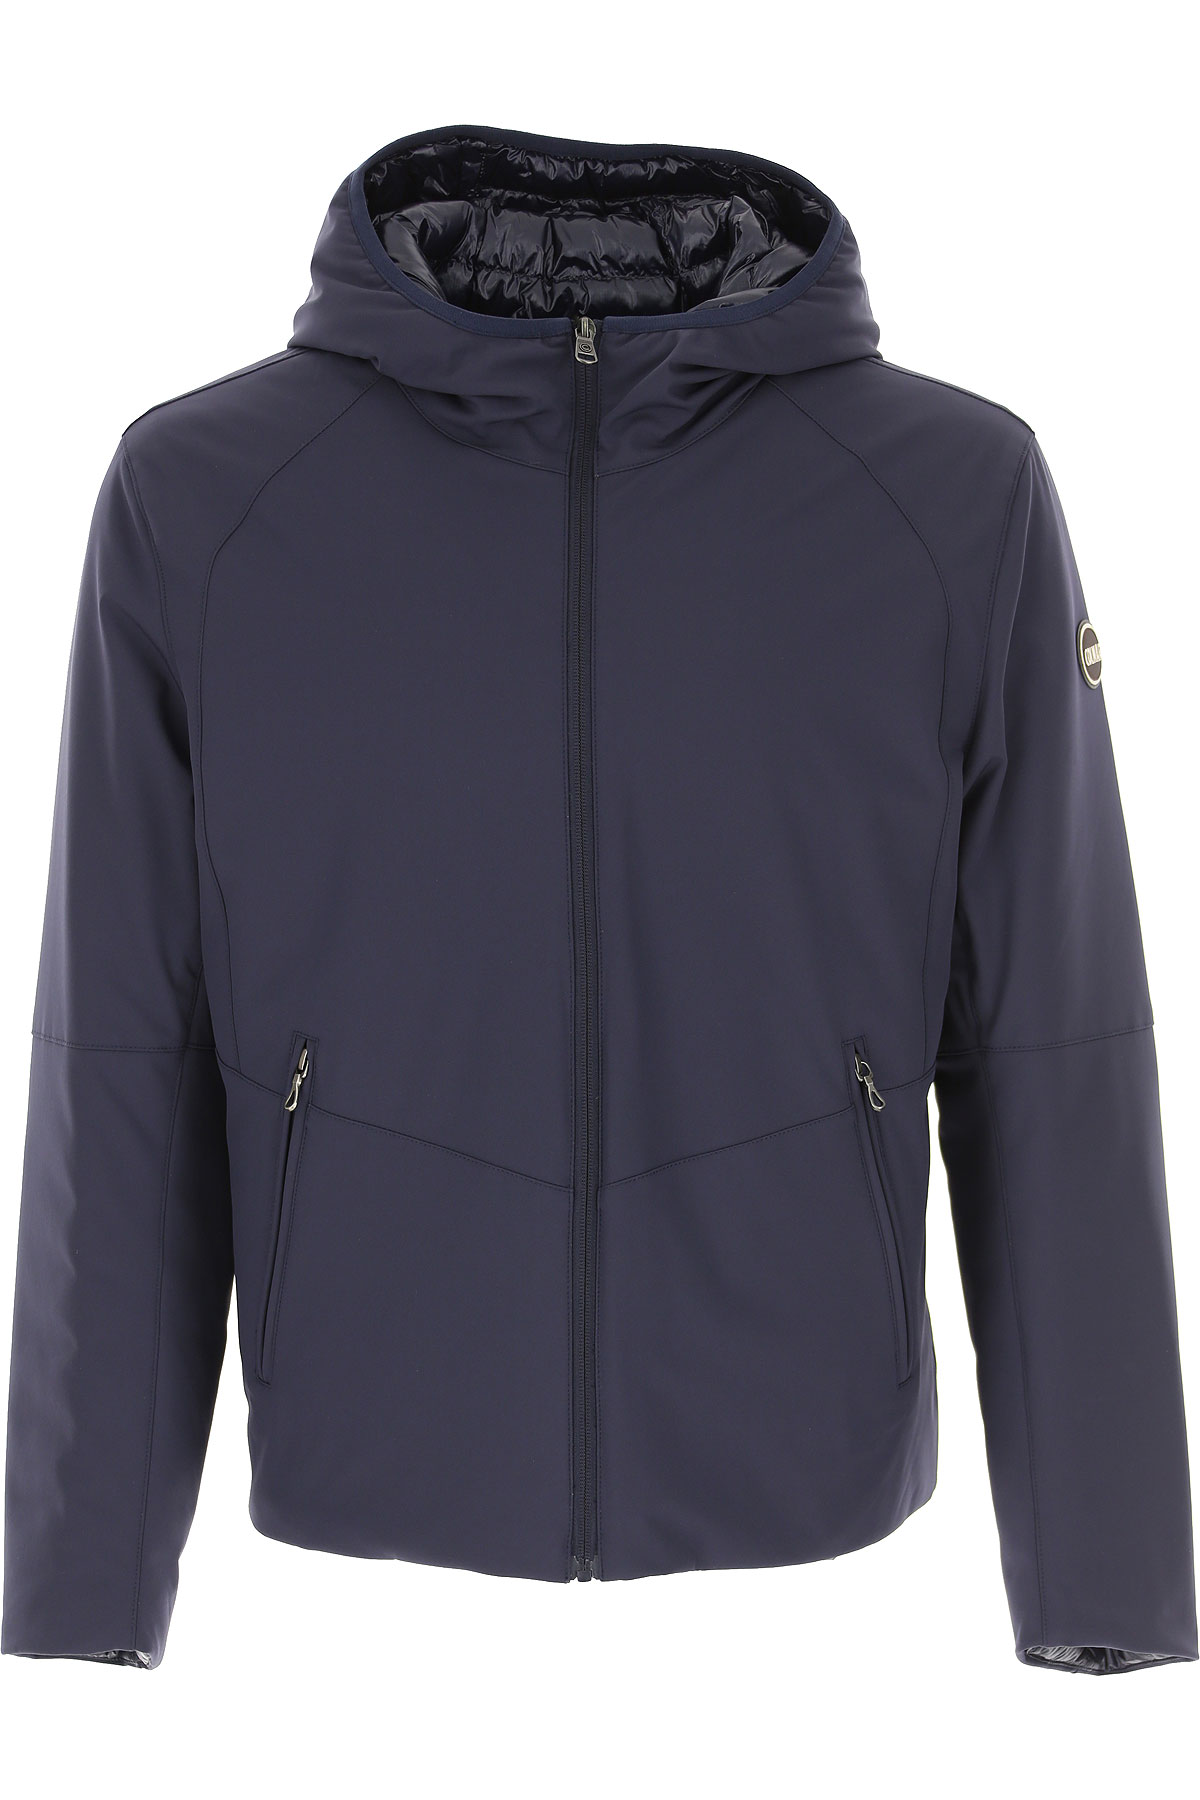 Colmar Jacket for Men, navy, polyester, 2019, M XXL